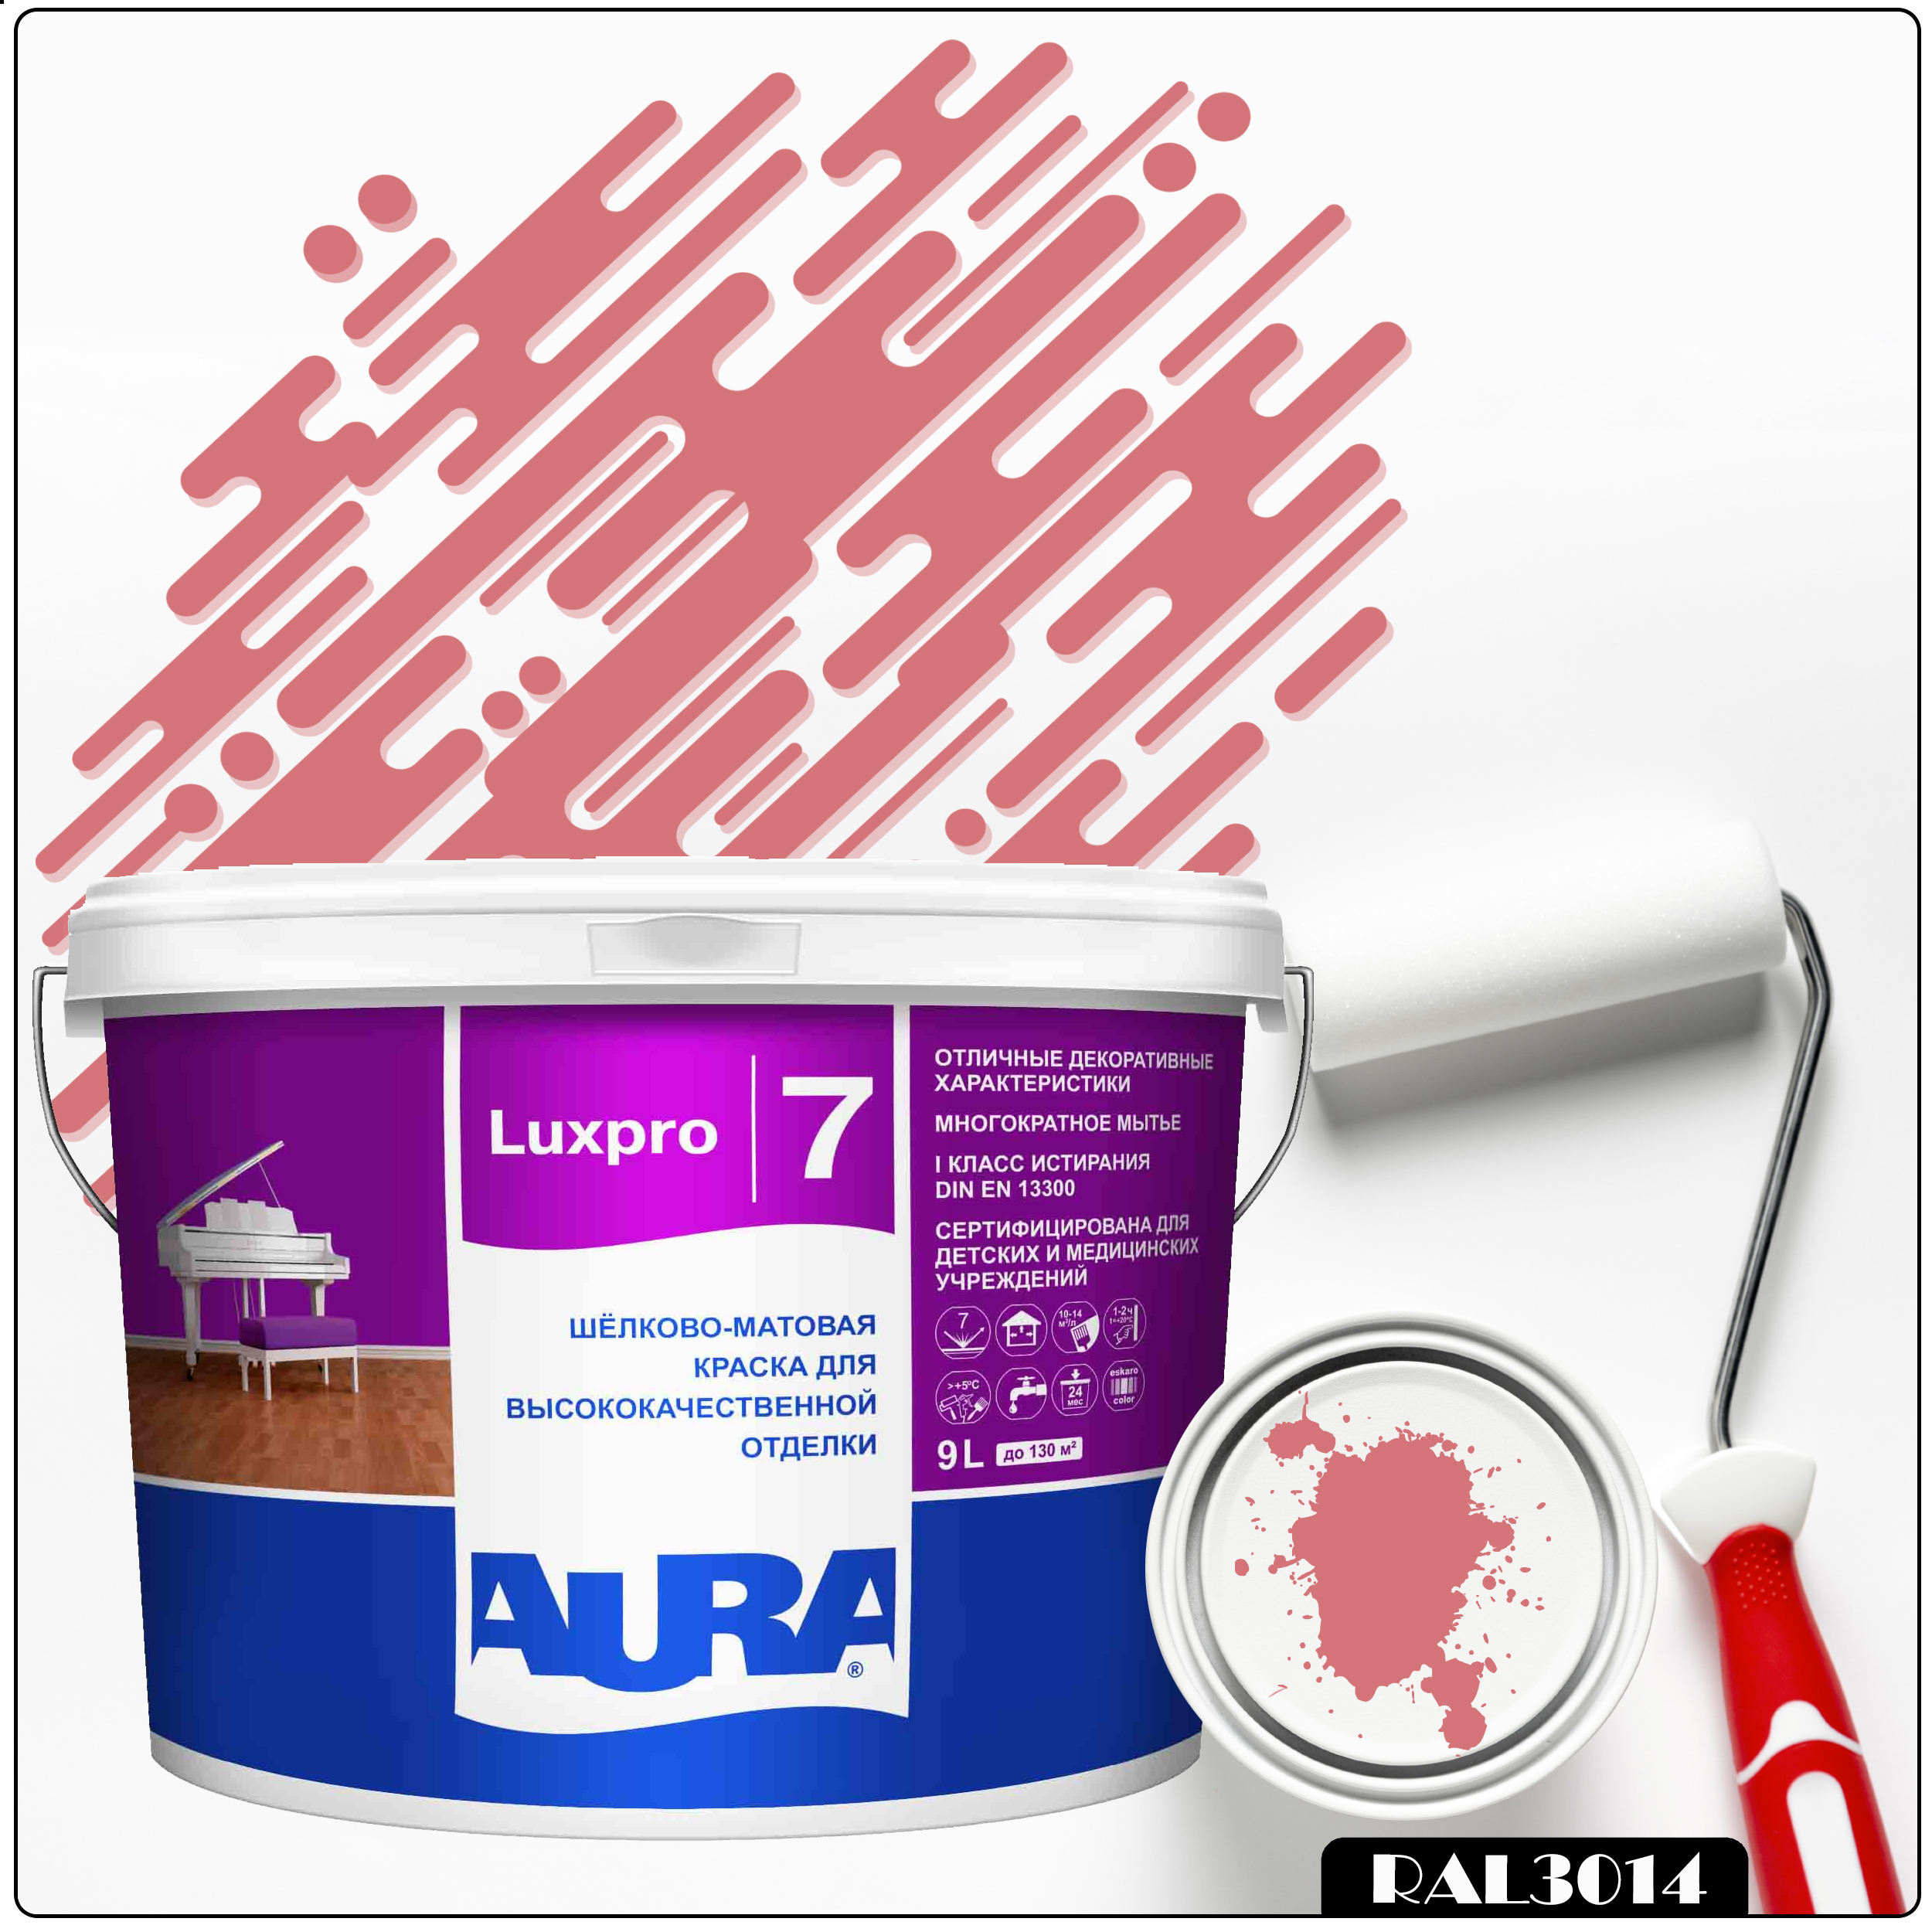 Фото 12 - Краска Aura LuxPRO 7, RAL 3014 Антик розовый, латексная, шелково-матовая, интерьерная, 9л, Аура.